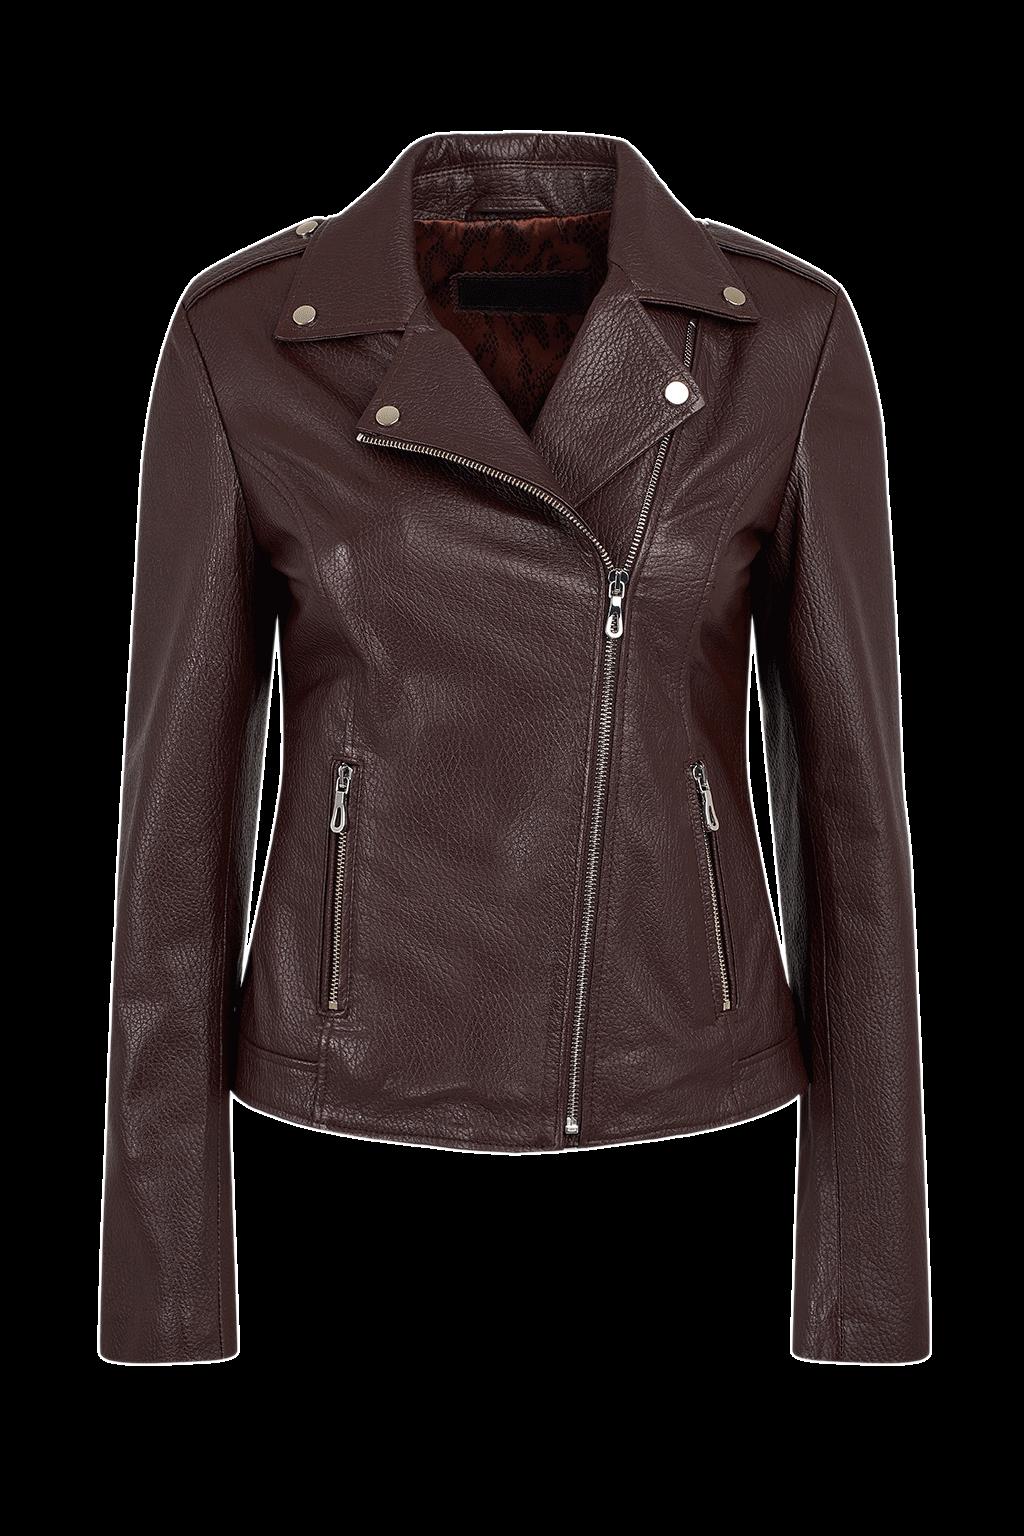 Women's Classic Biker Jacket - Maroon